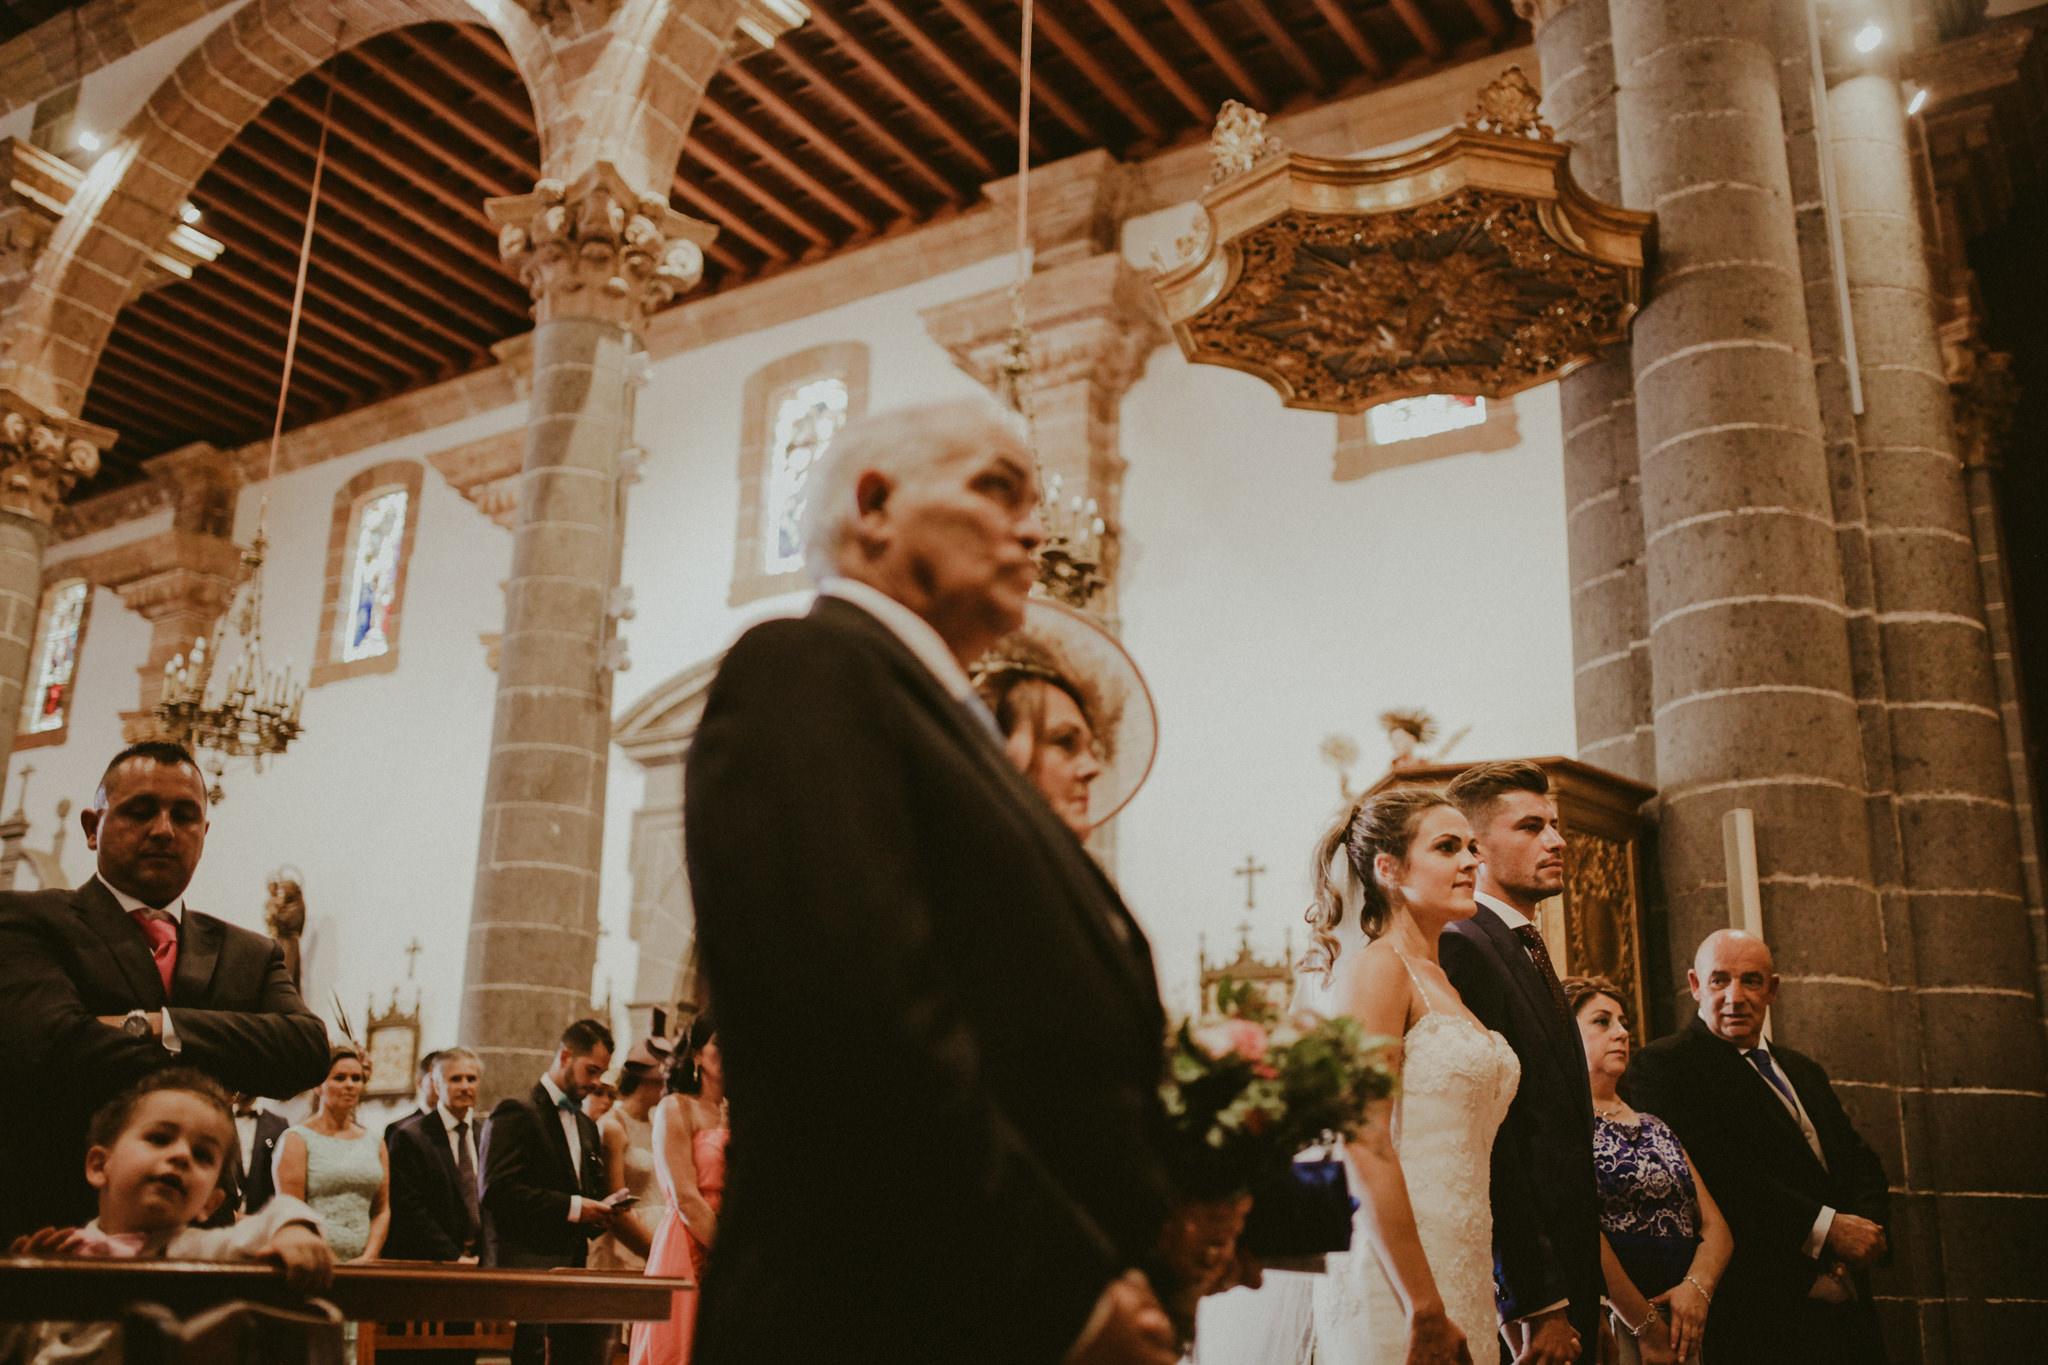 boda-diferente-fotografo-boda-laspalmas-grancanaria-35